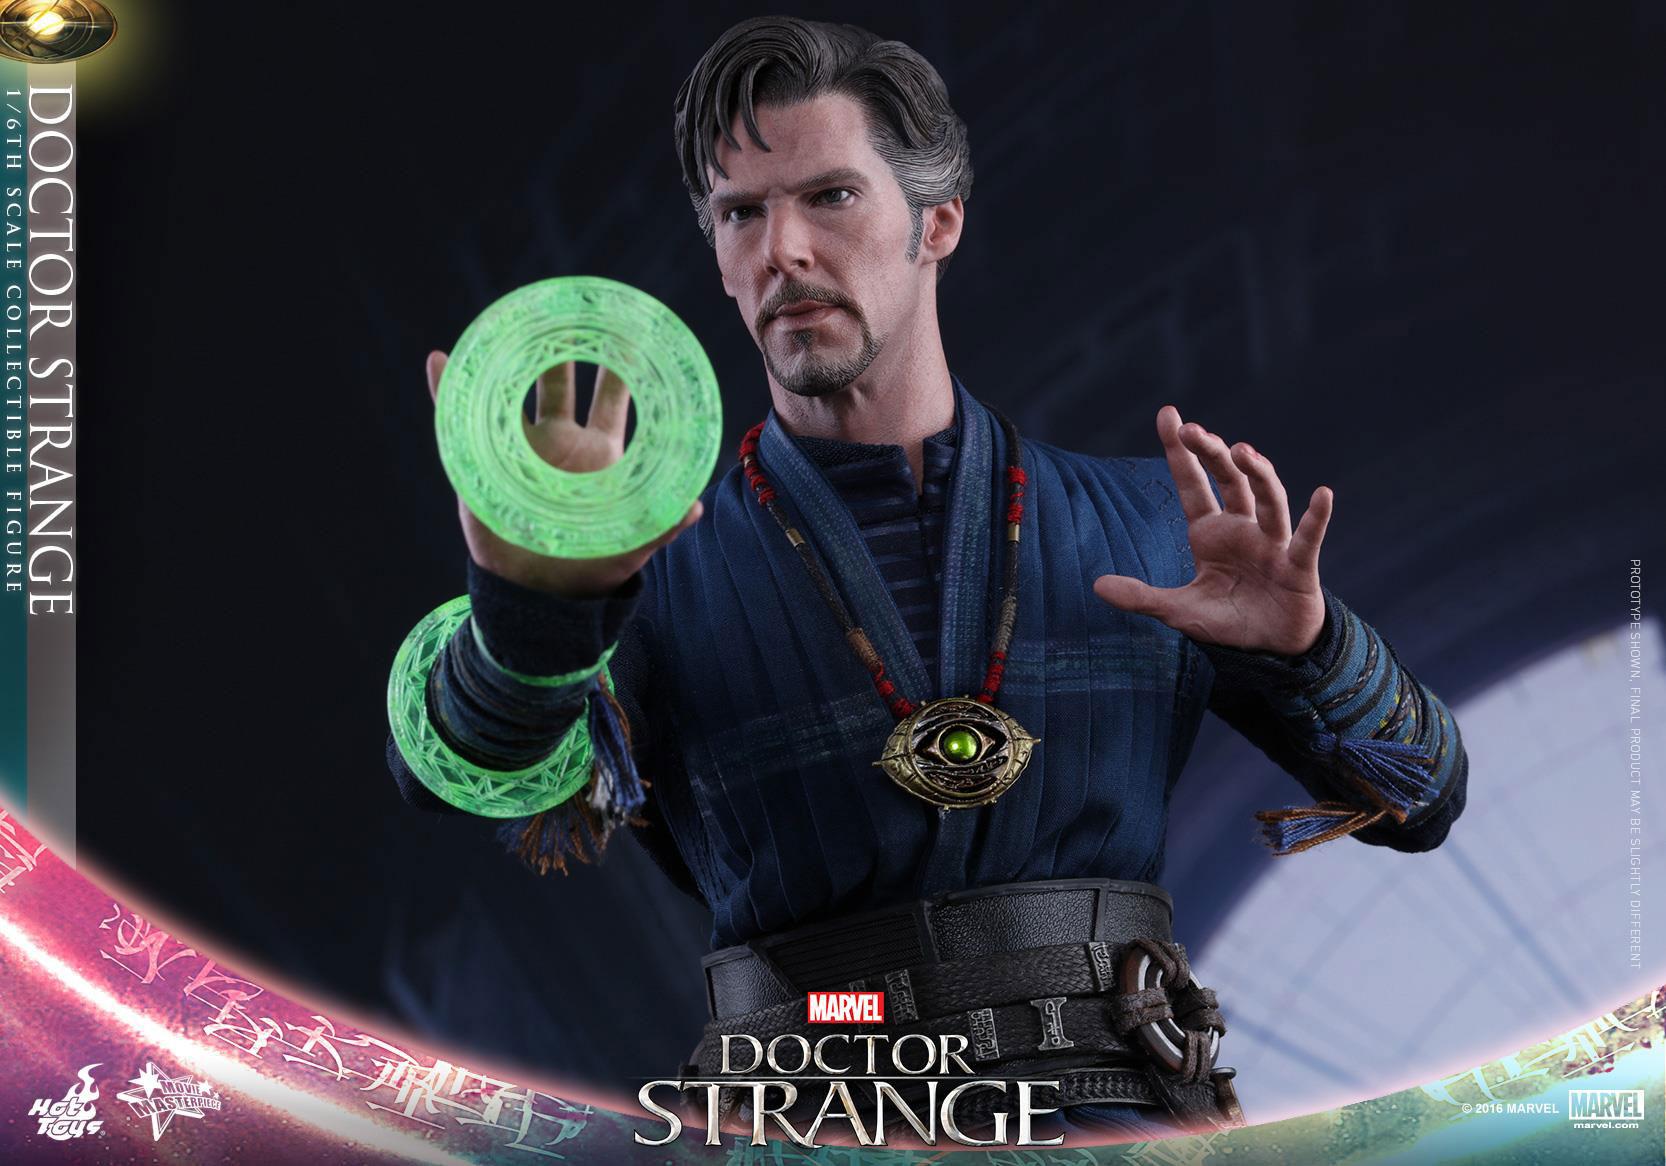 hot-toys-doctor-strange-movie-figure-mandalas-1